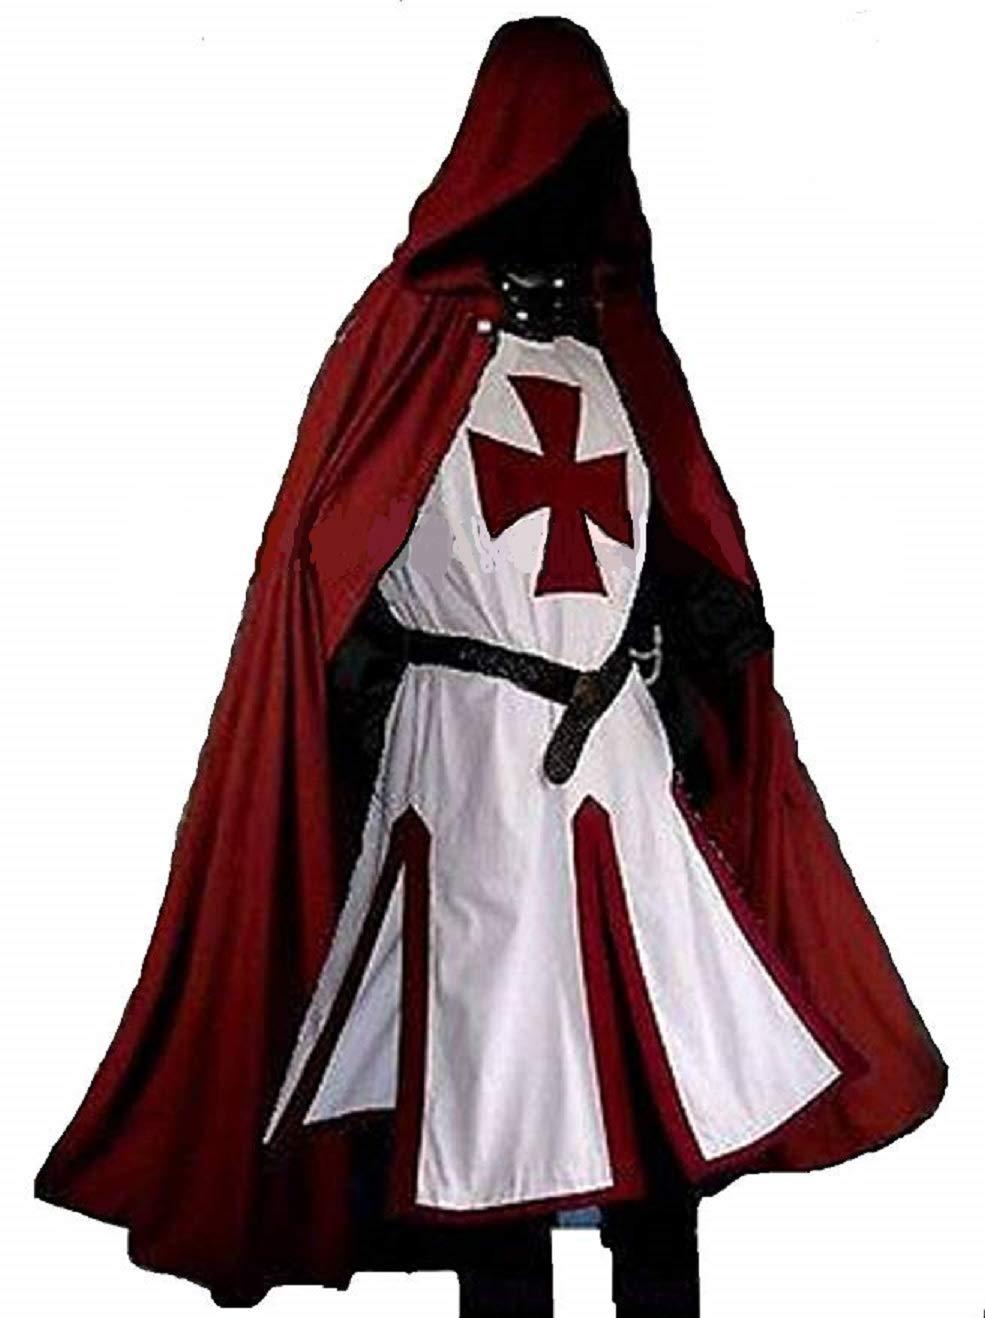 ANTIQUECOLLECTION Medieval Templar Knight Crusader Surcoat & Cloak Reenactment LARP